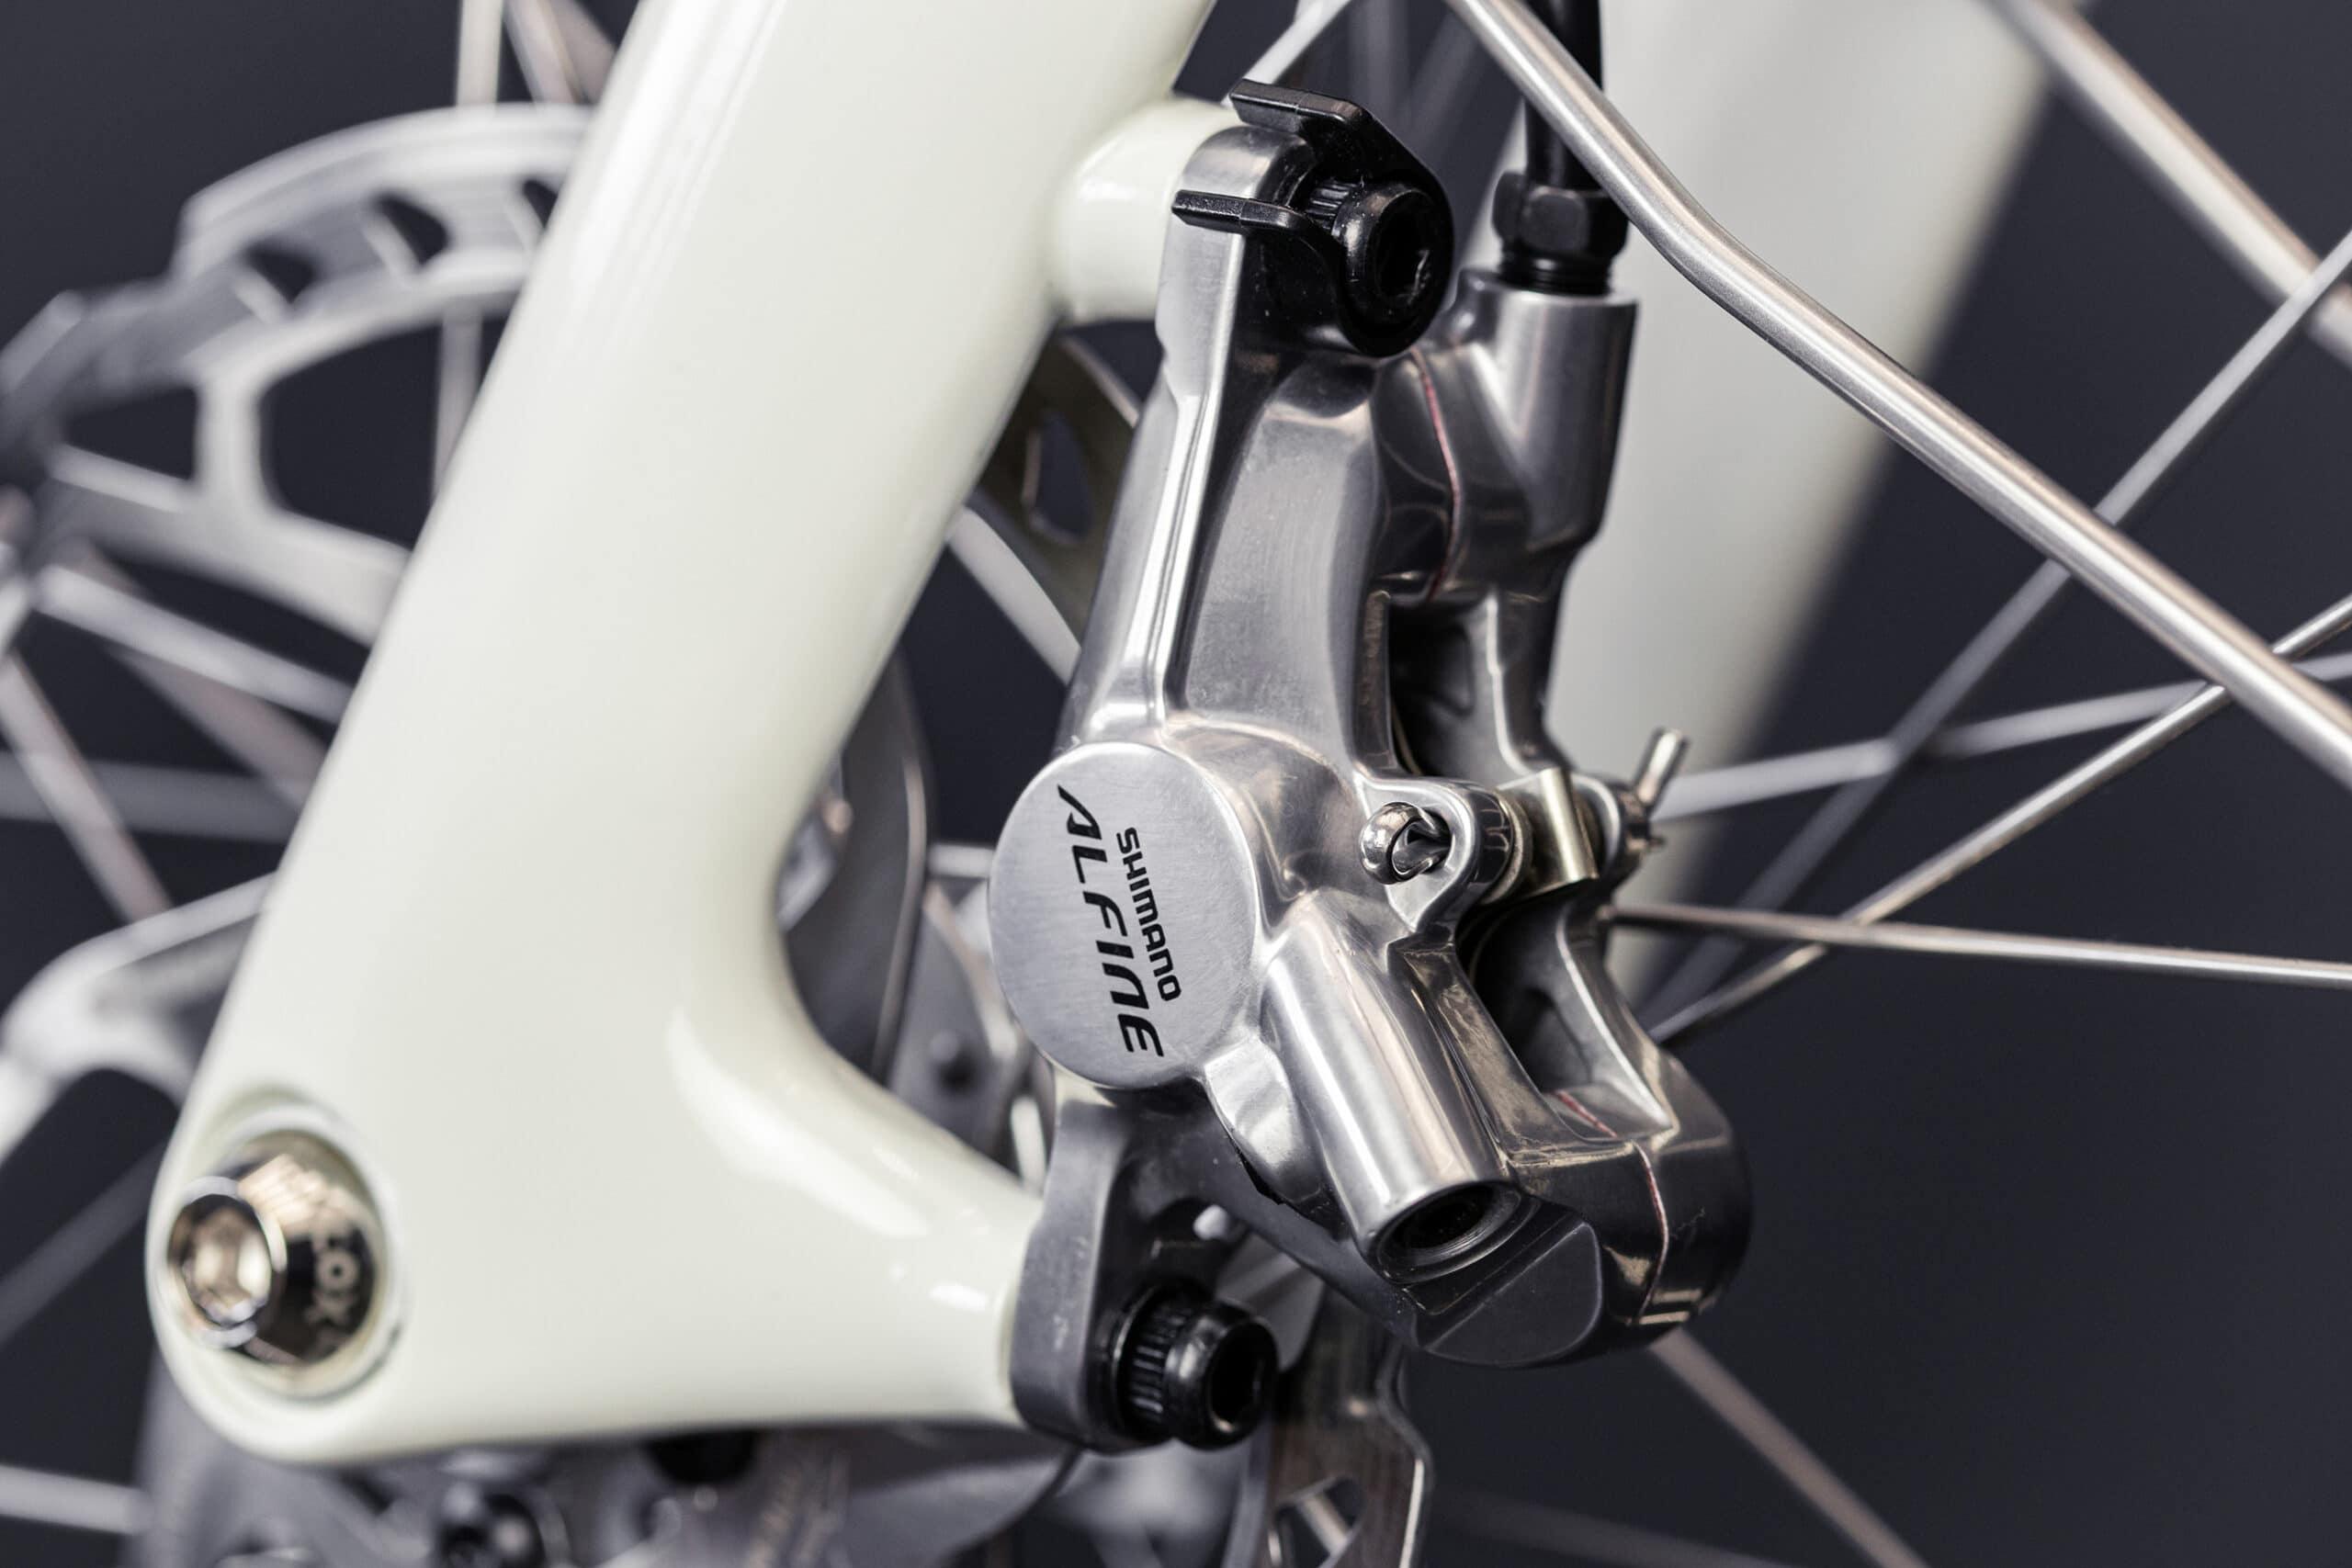 schindelhauer Antonia Pinion e-bike -18